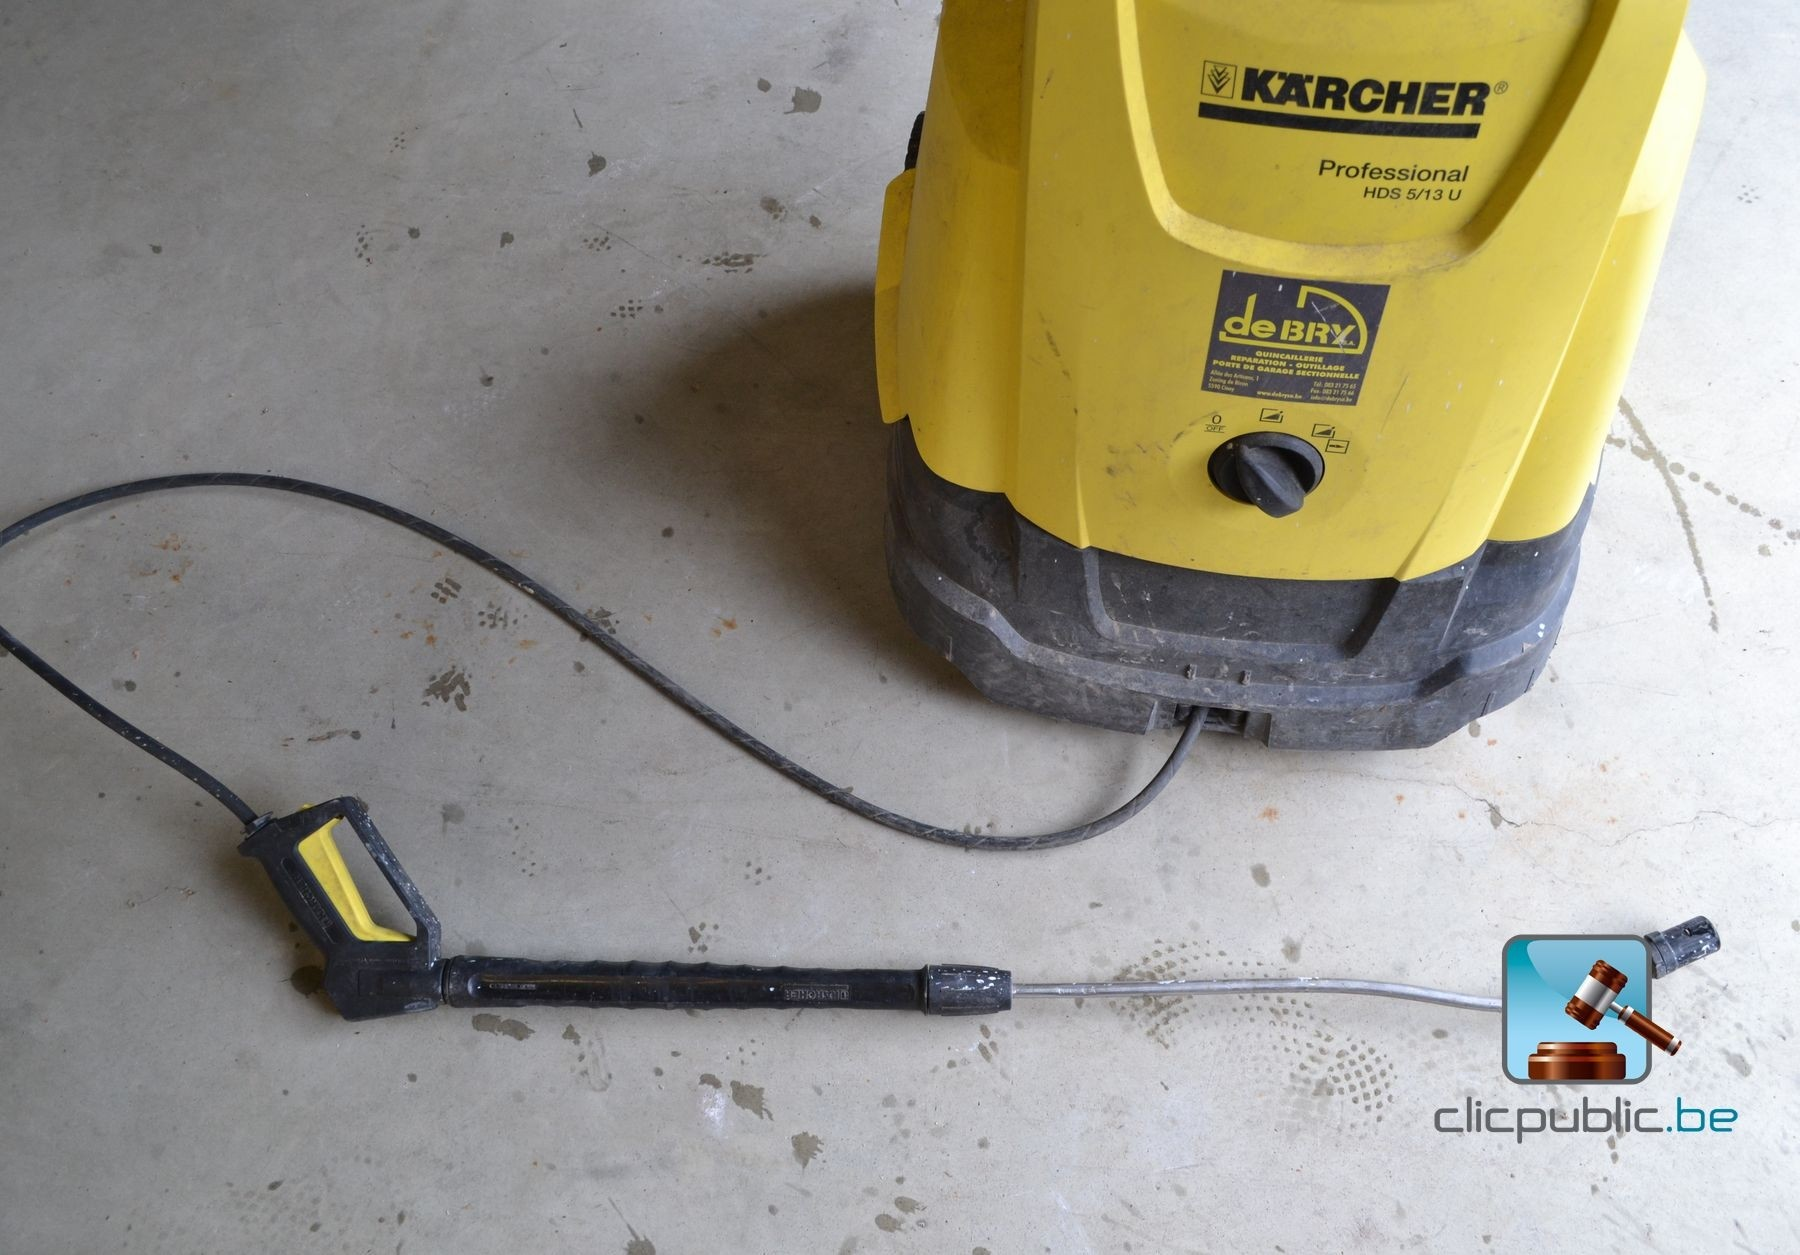 Nettoyeur haute pression karcher hds 5 13u ref 5 for Fonctionnement nettoyeur haute pression